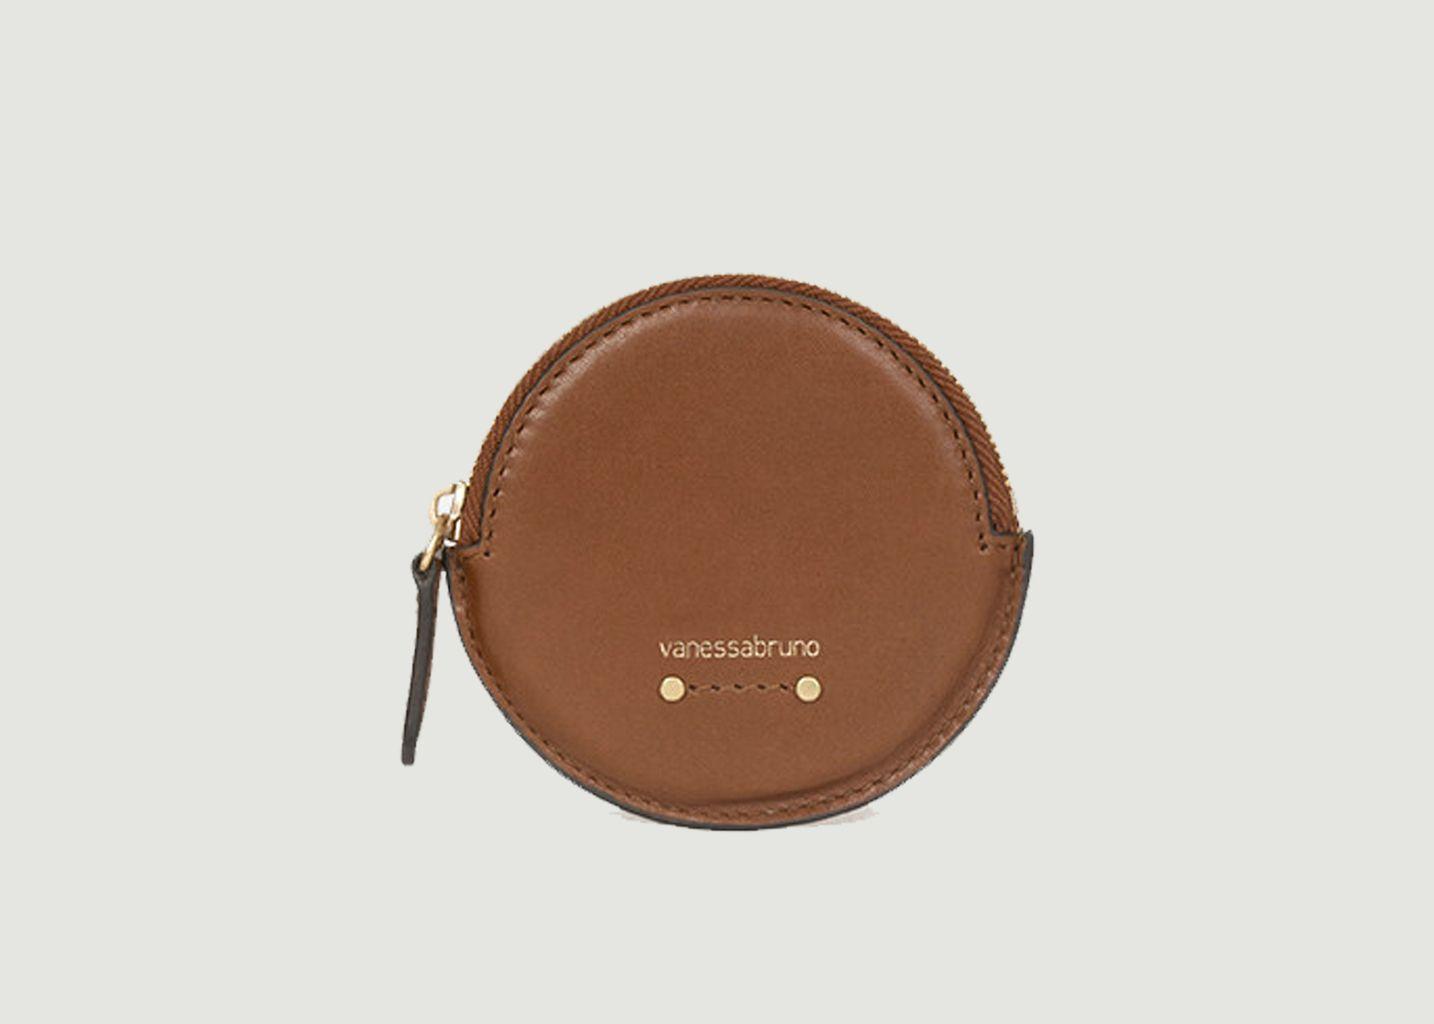 Porte-monnaie rond en cuir - Vanessa Bruno